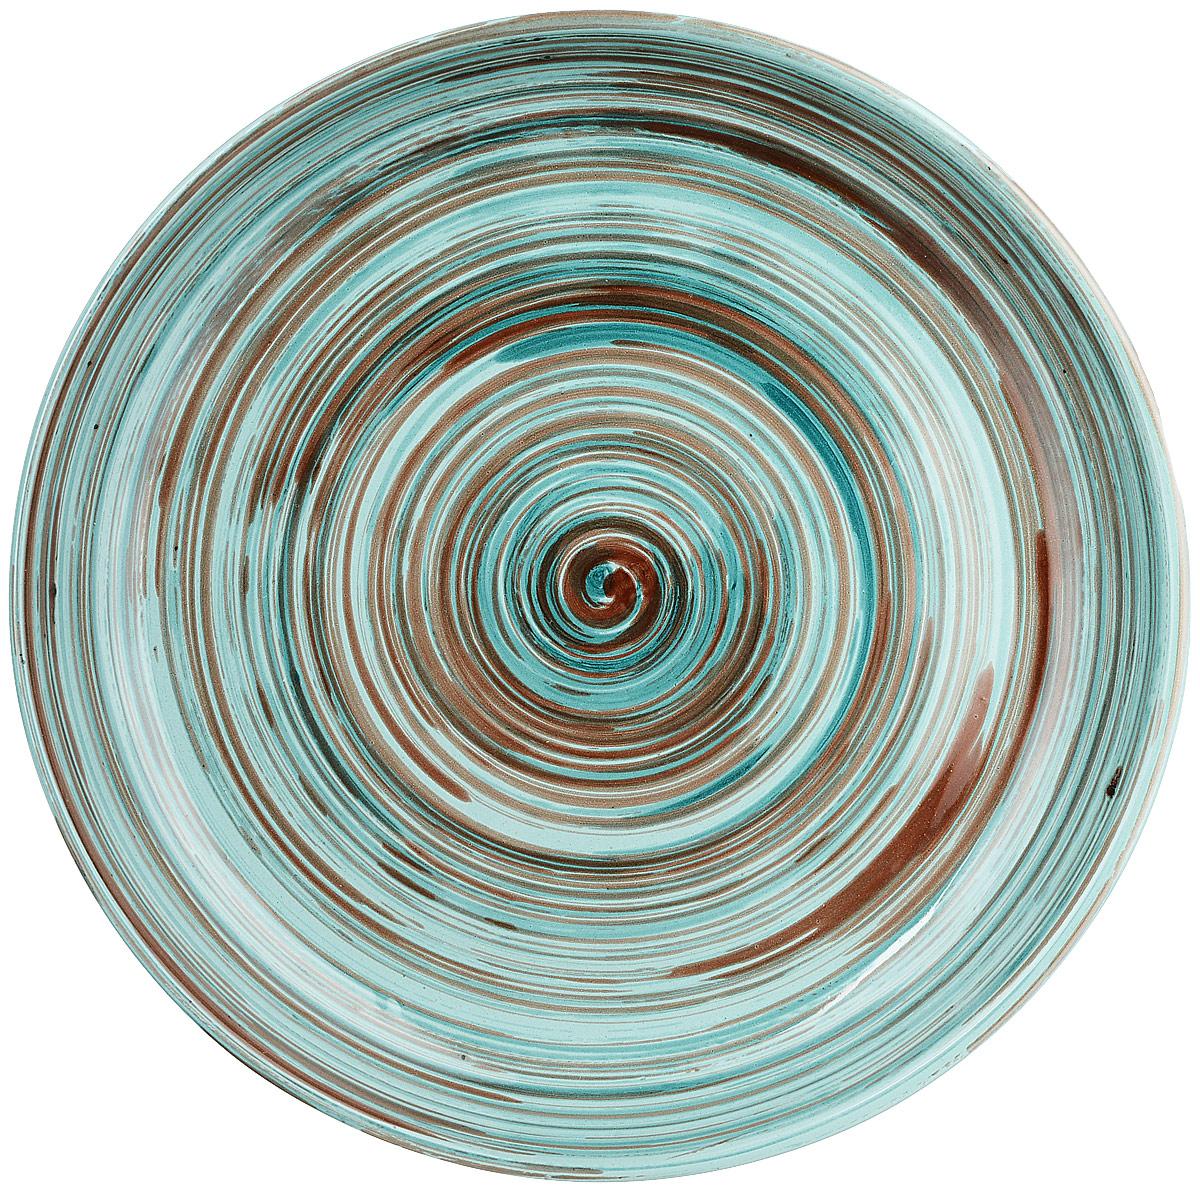 Тарелка для нарезки РАД14458221. Материал: Керамика. Объем: 0,5